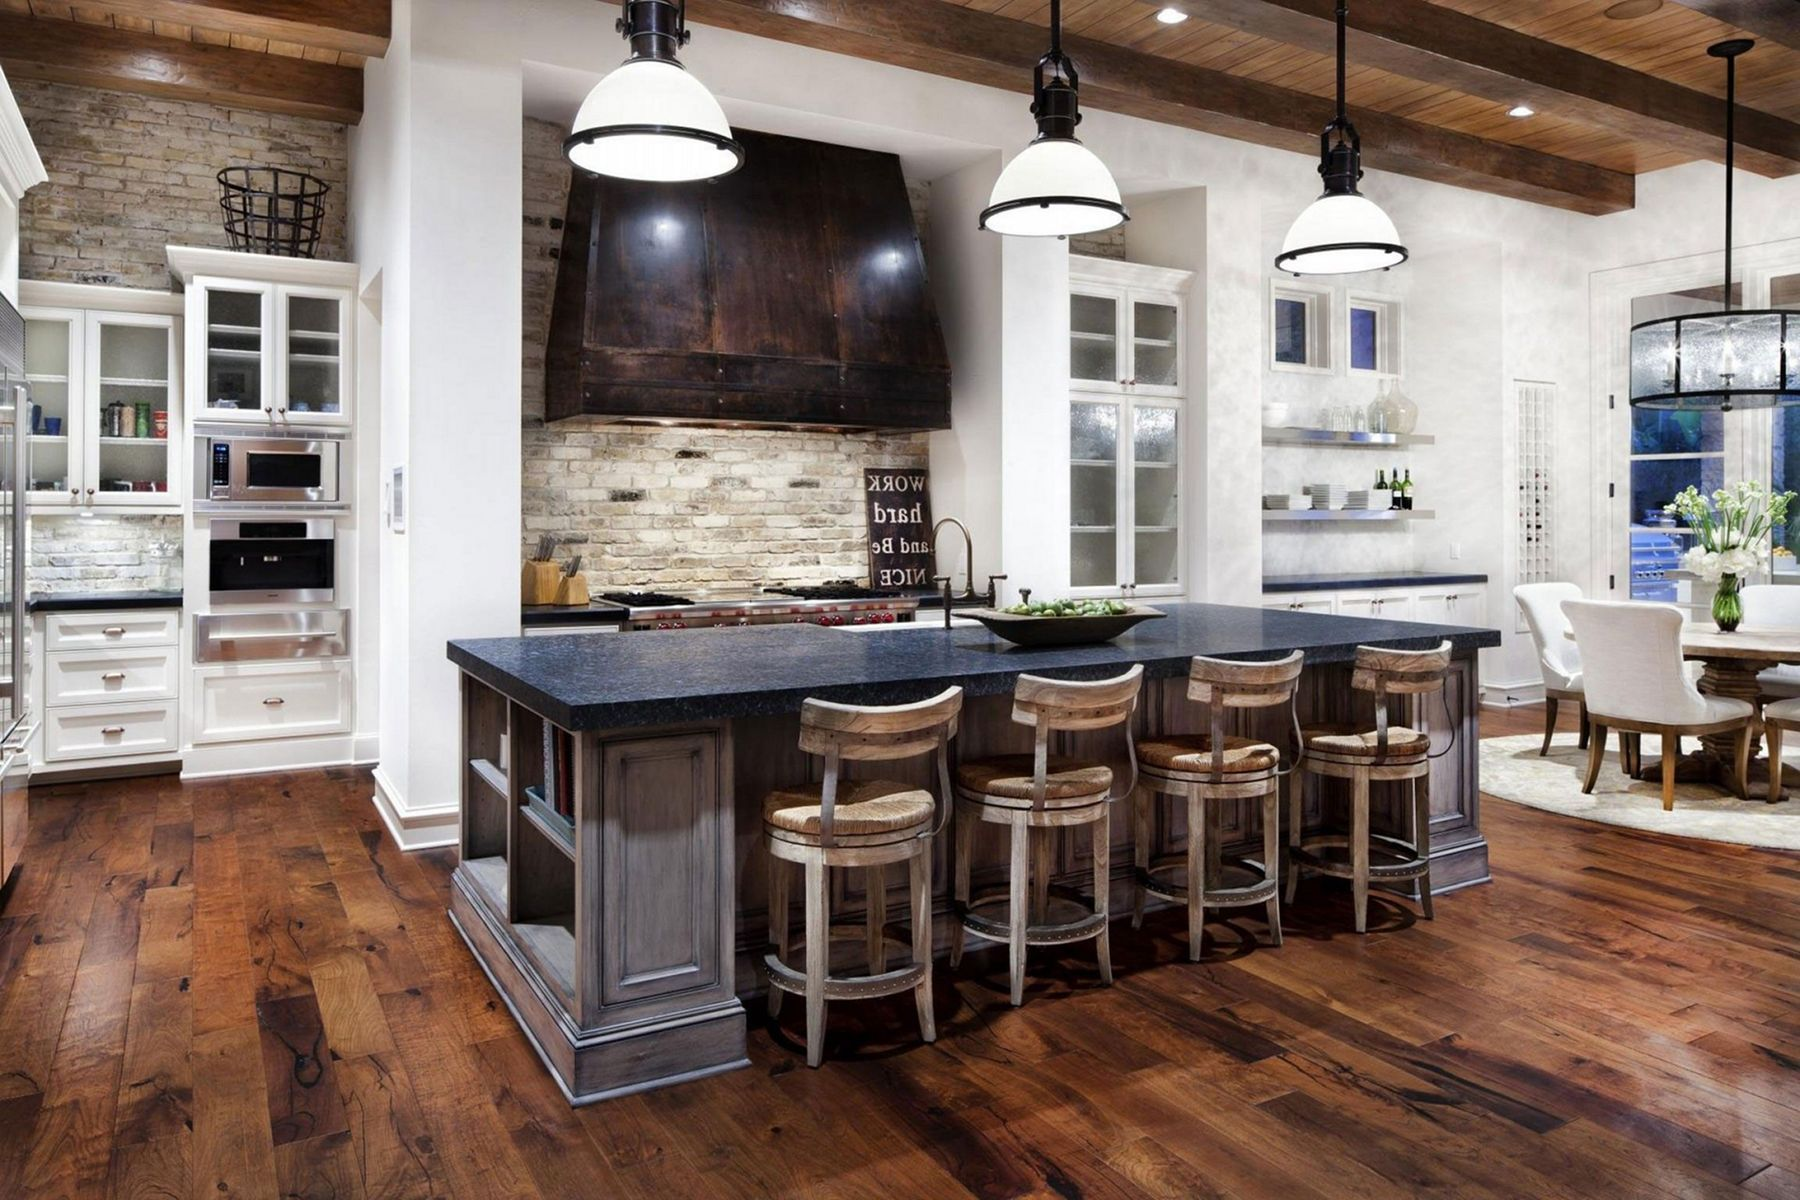 Rustic Contemporary Interior Design | Rustic kitchen ...